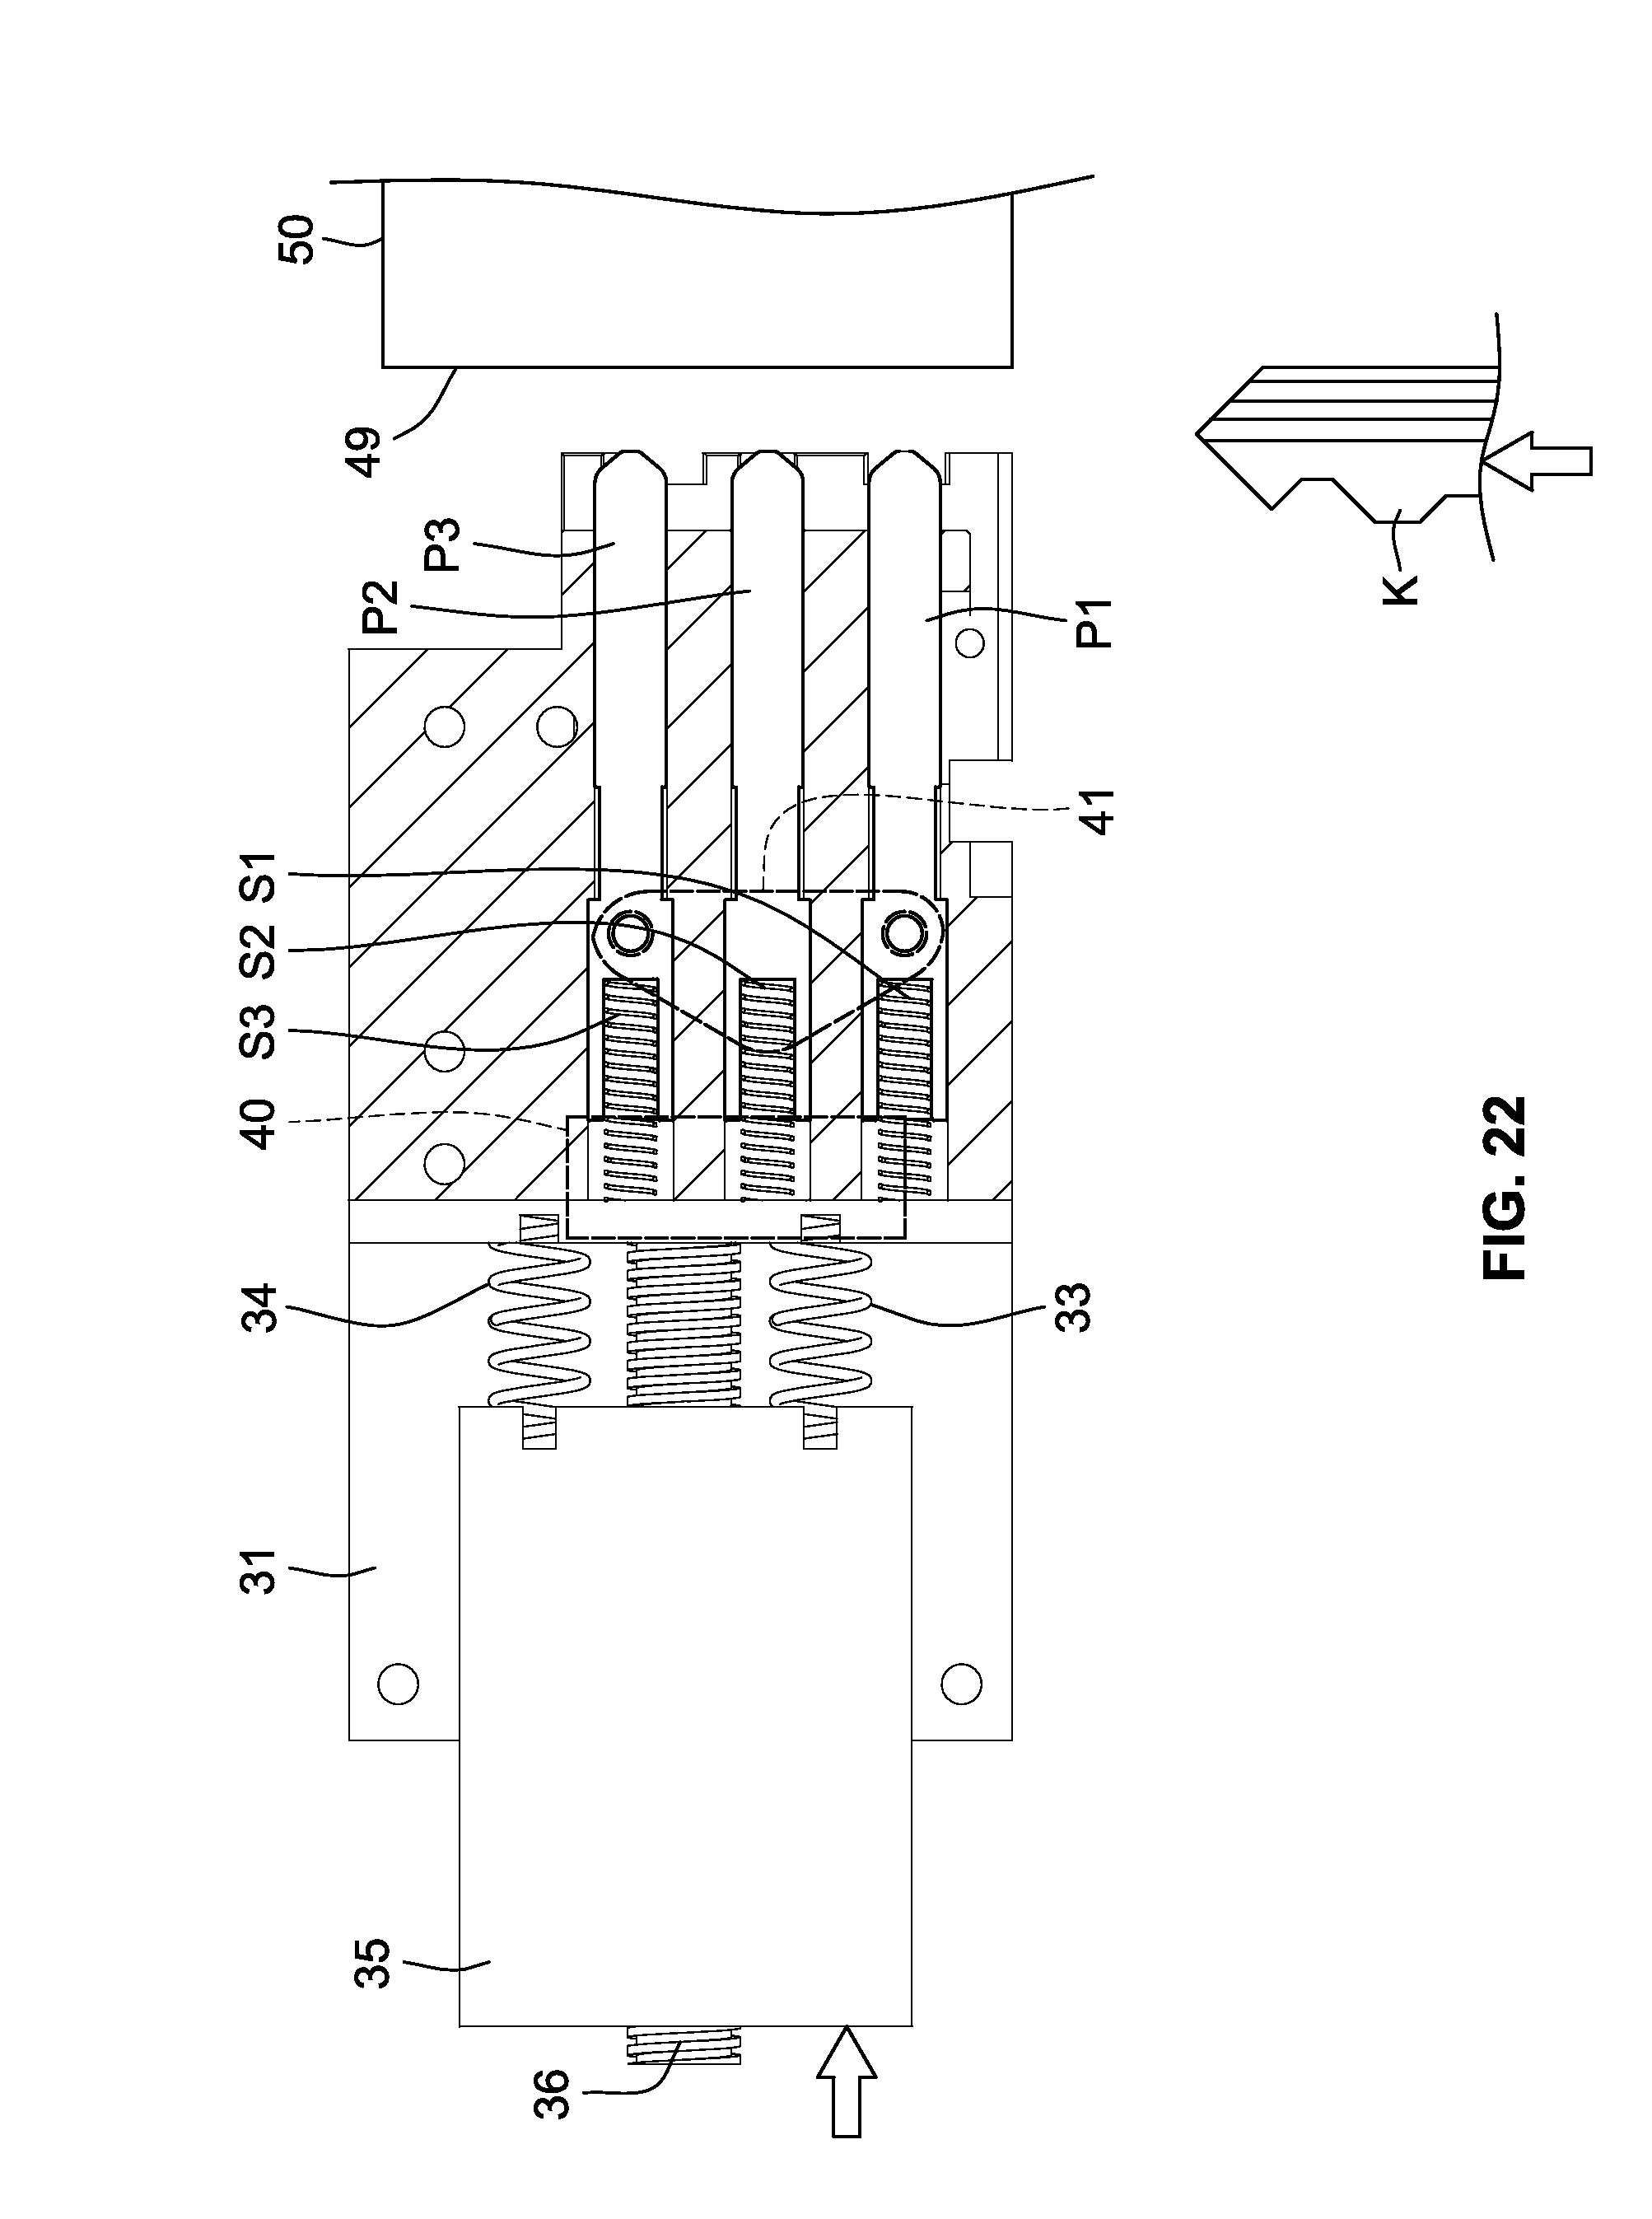 2001 Mercury 200 Efi Wiring Diagram. Mercury. Auto Wiring